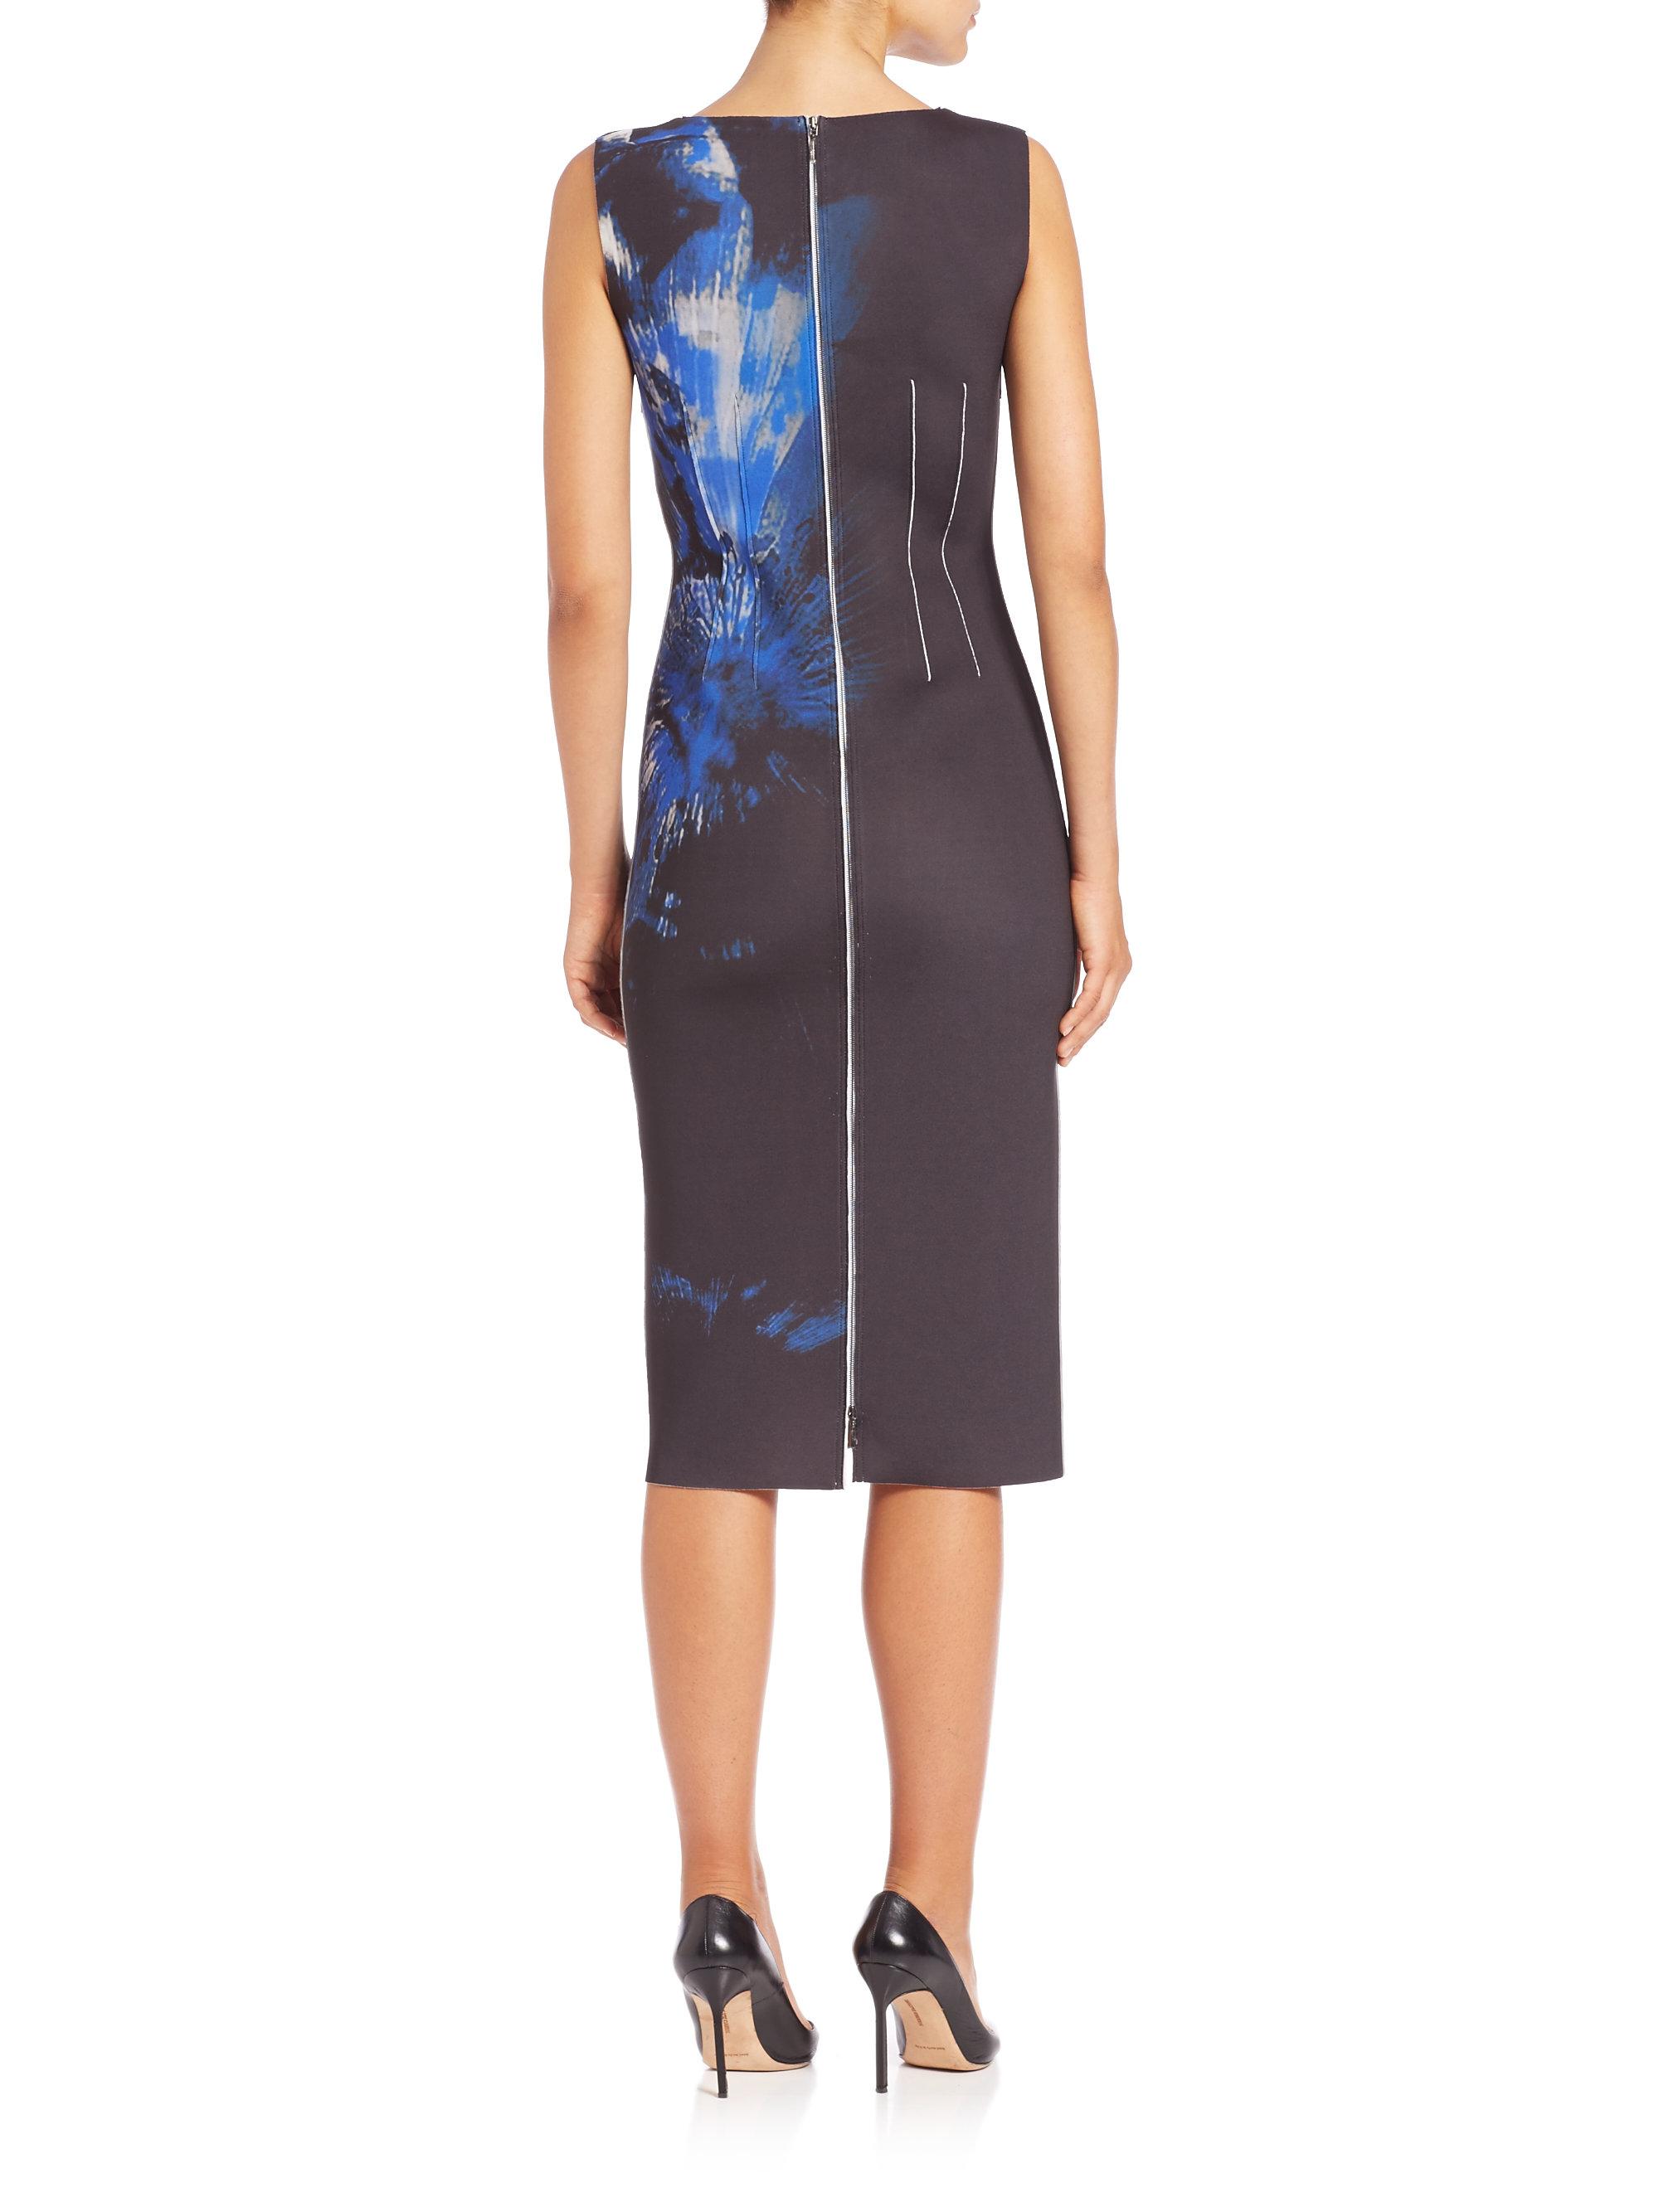 4051f84519e6 Lyst - Elie Tahari Gwenyth Floral Print Dress